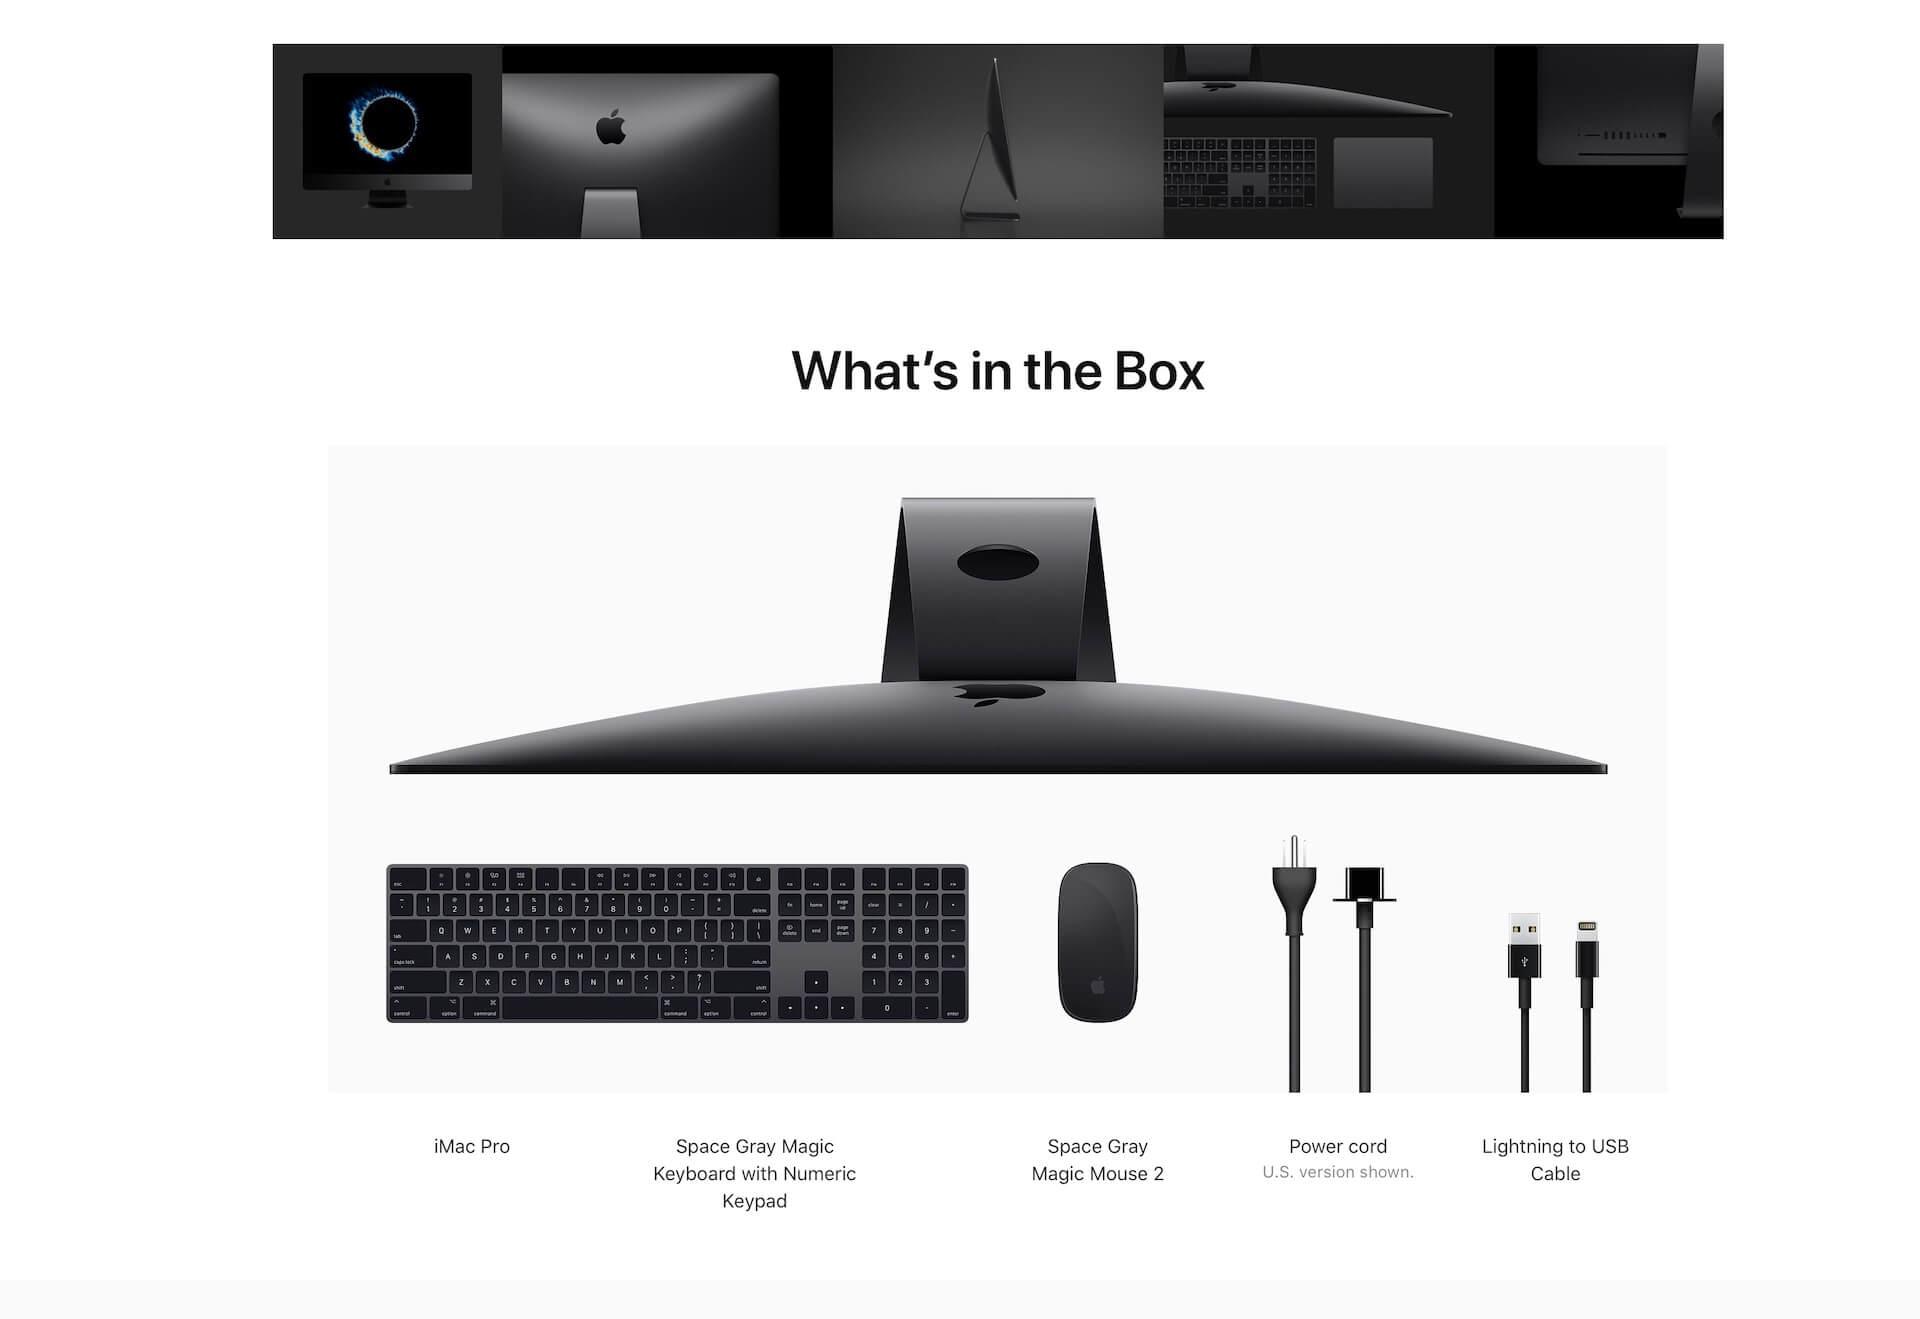 iMac Pro discontinued